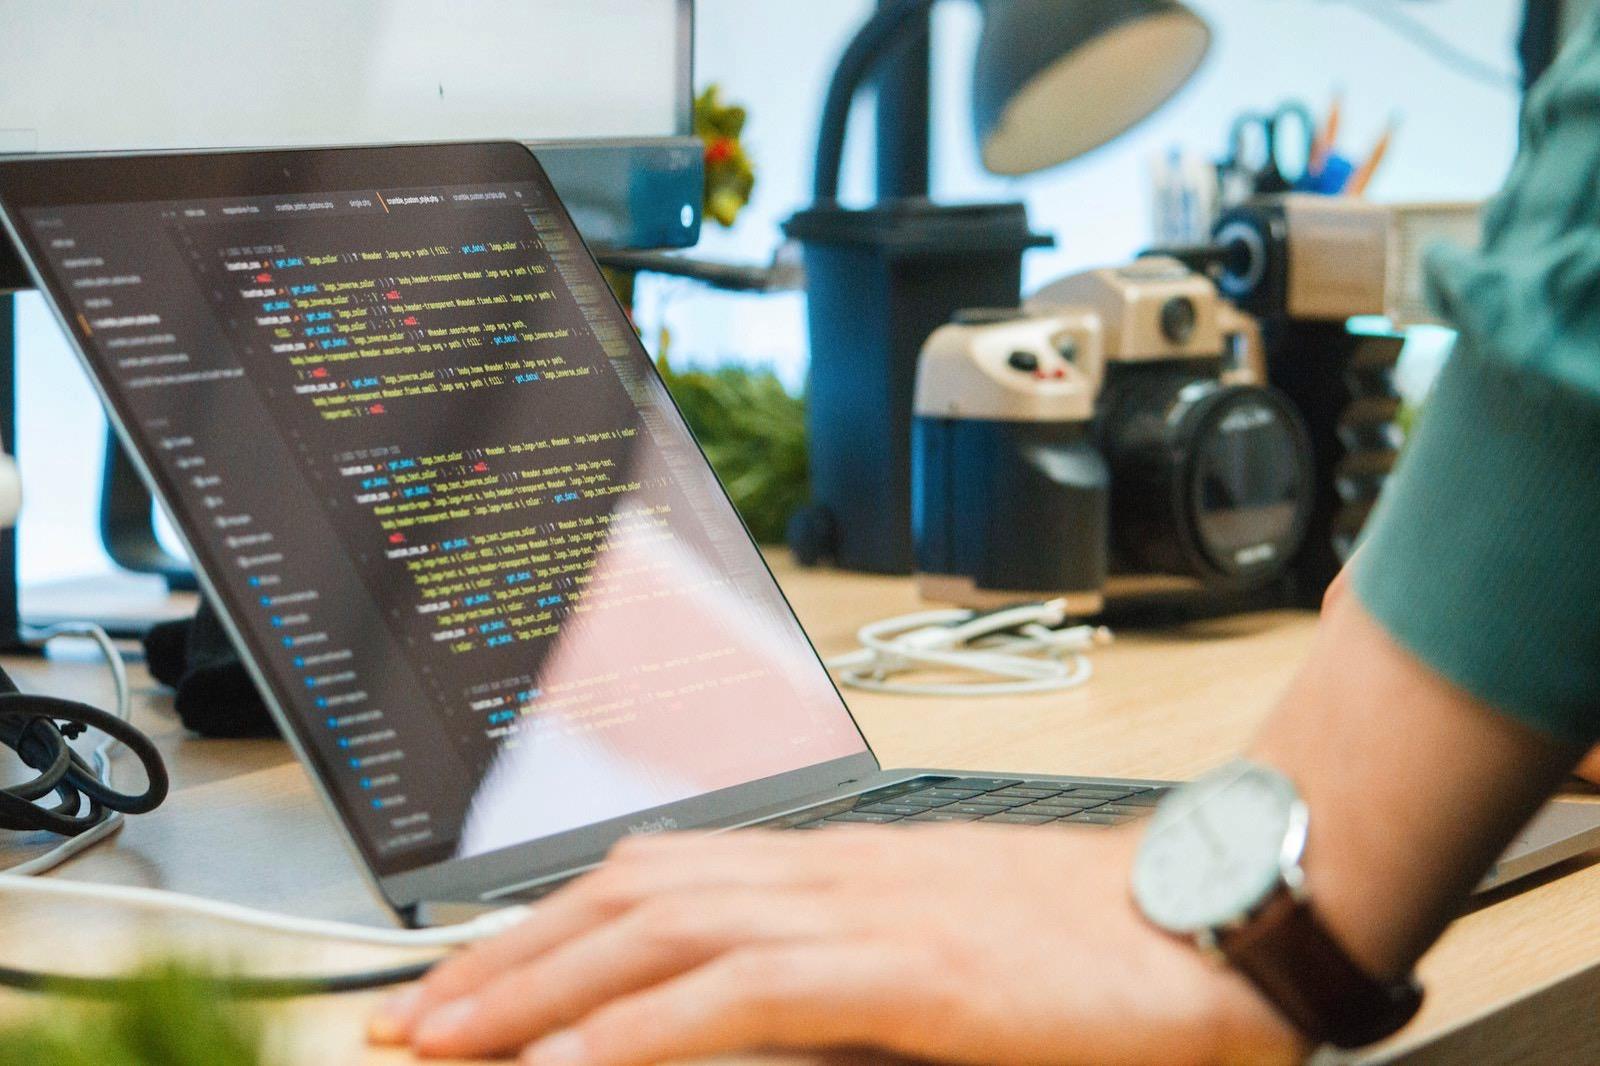 Fatos bytyqi 535528 unsplash programming and code